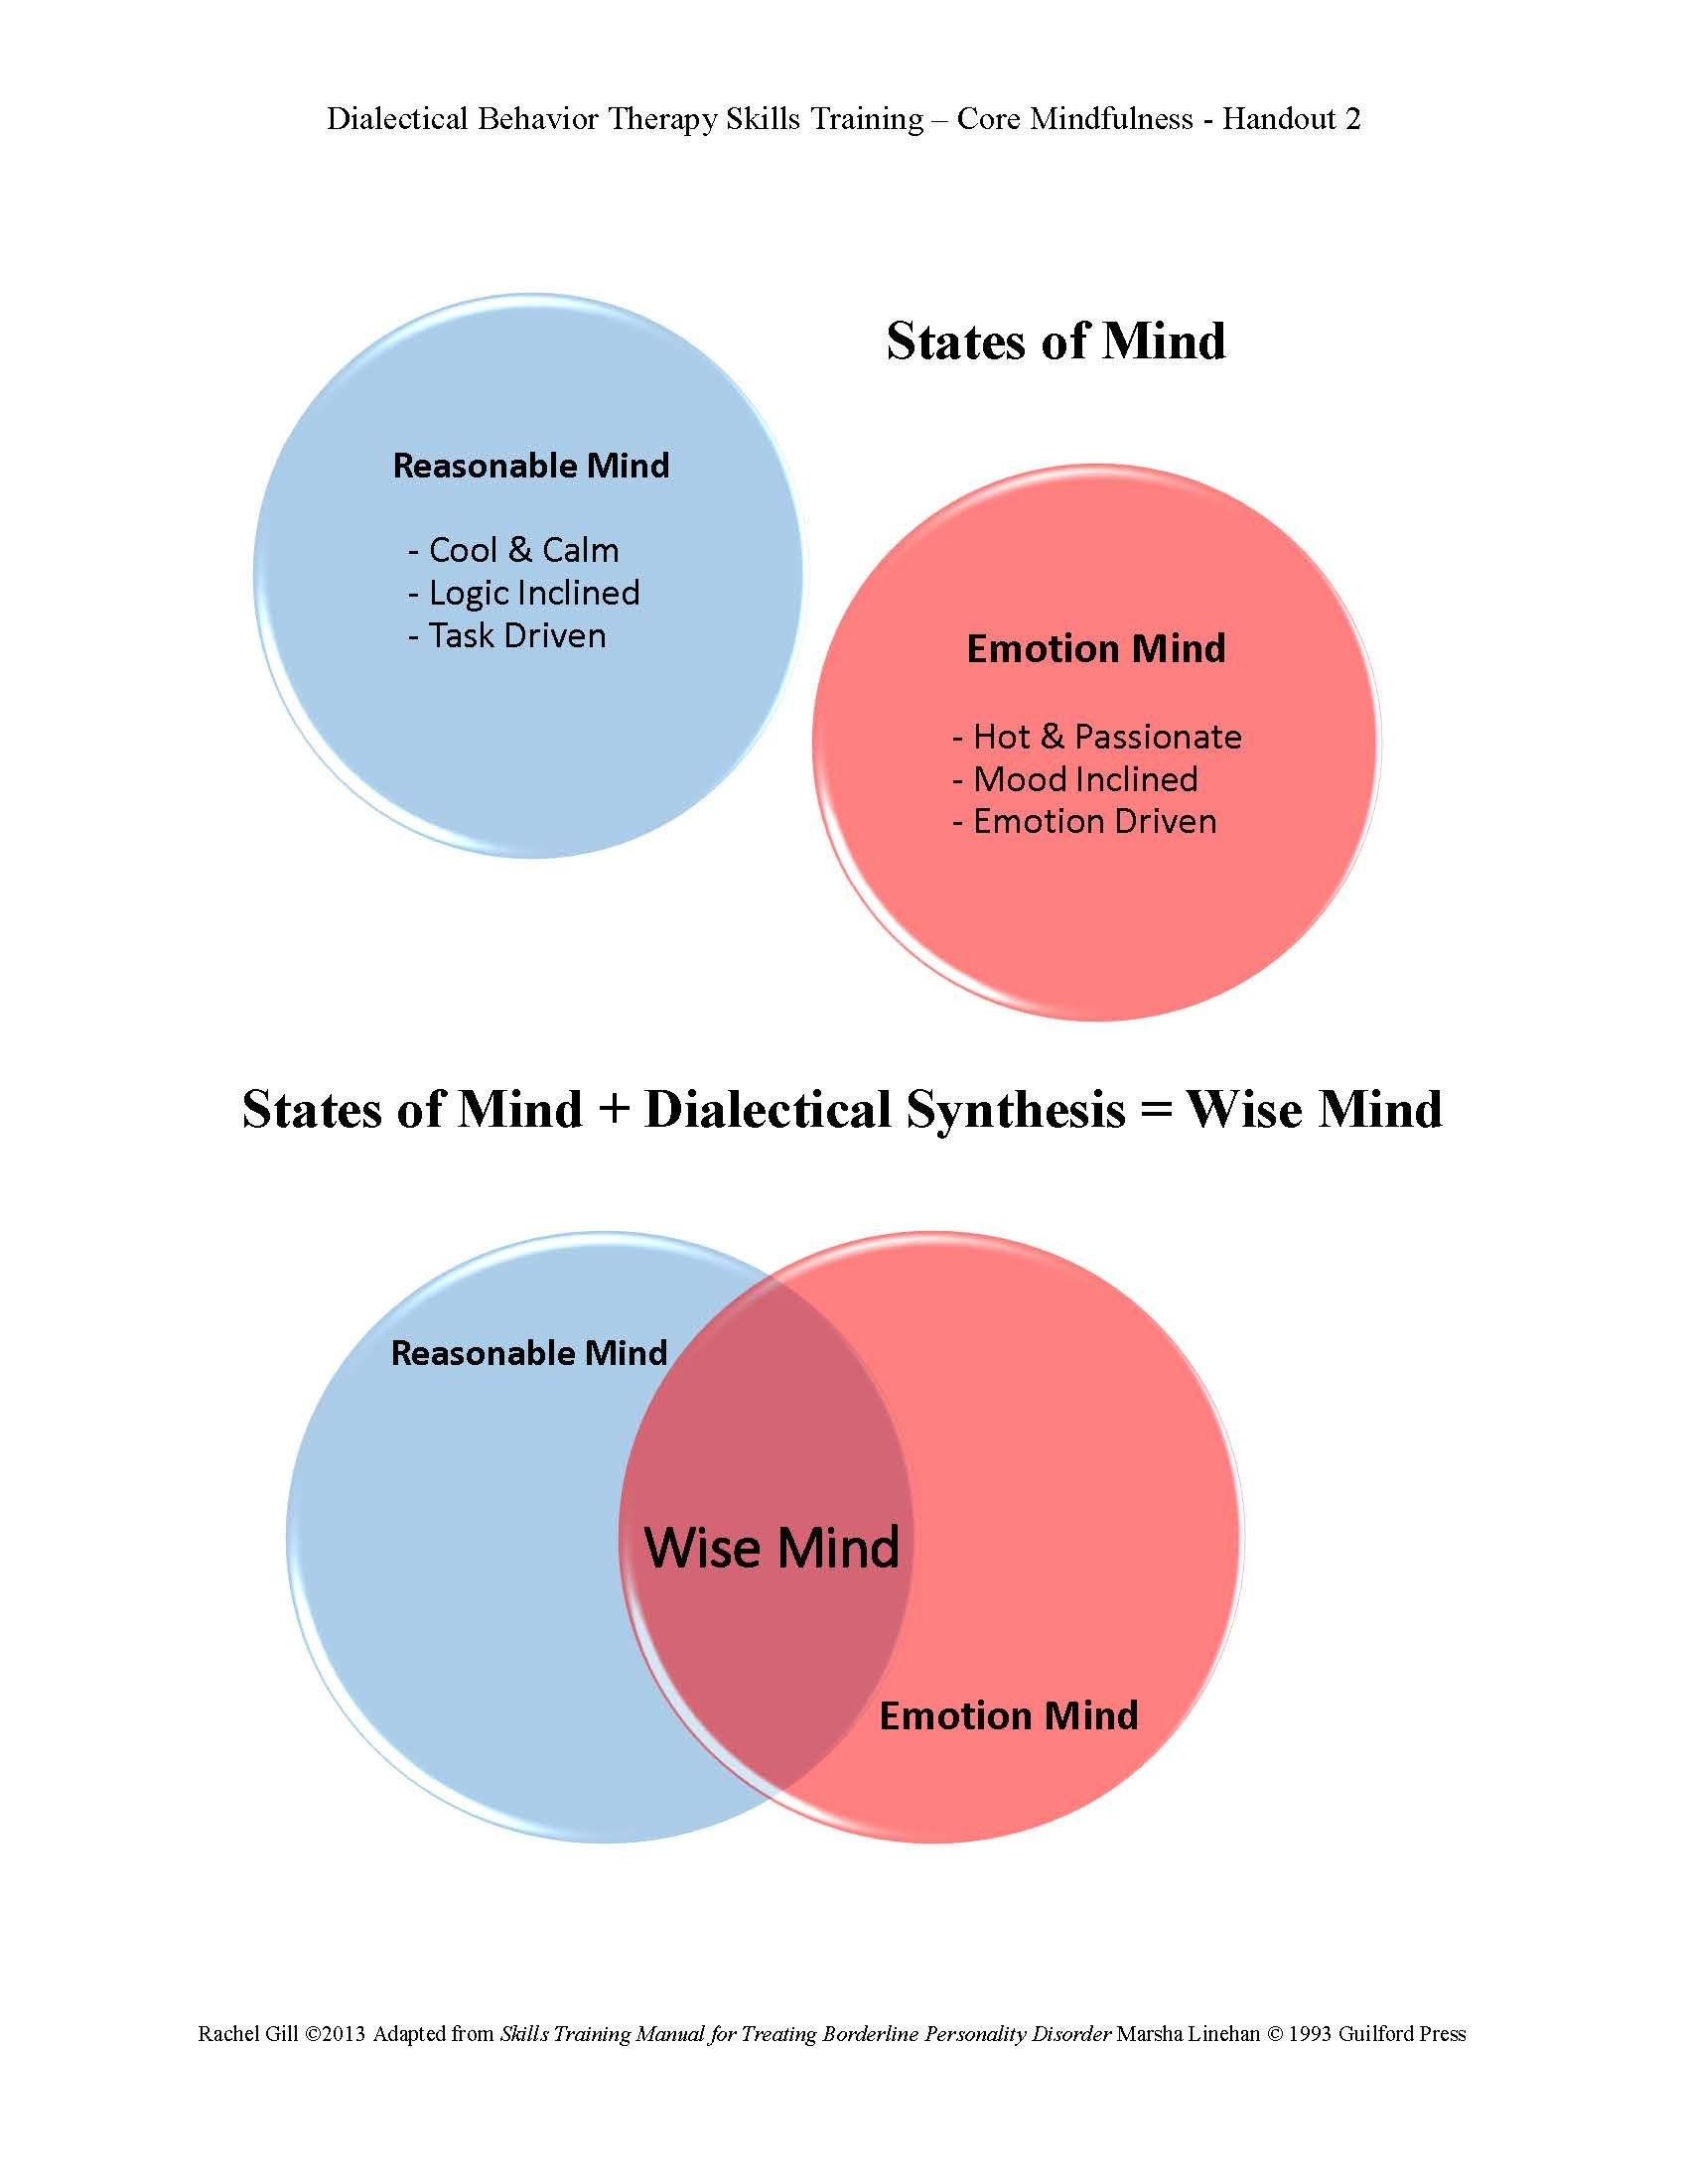 Dbt States Of Mind